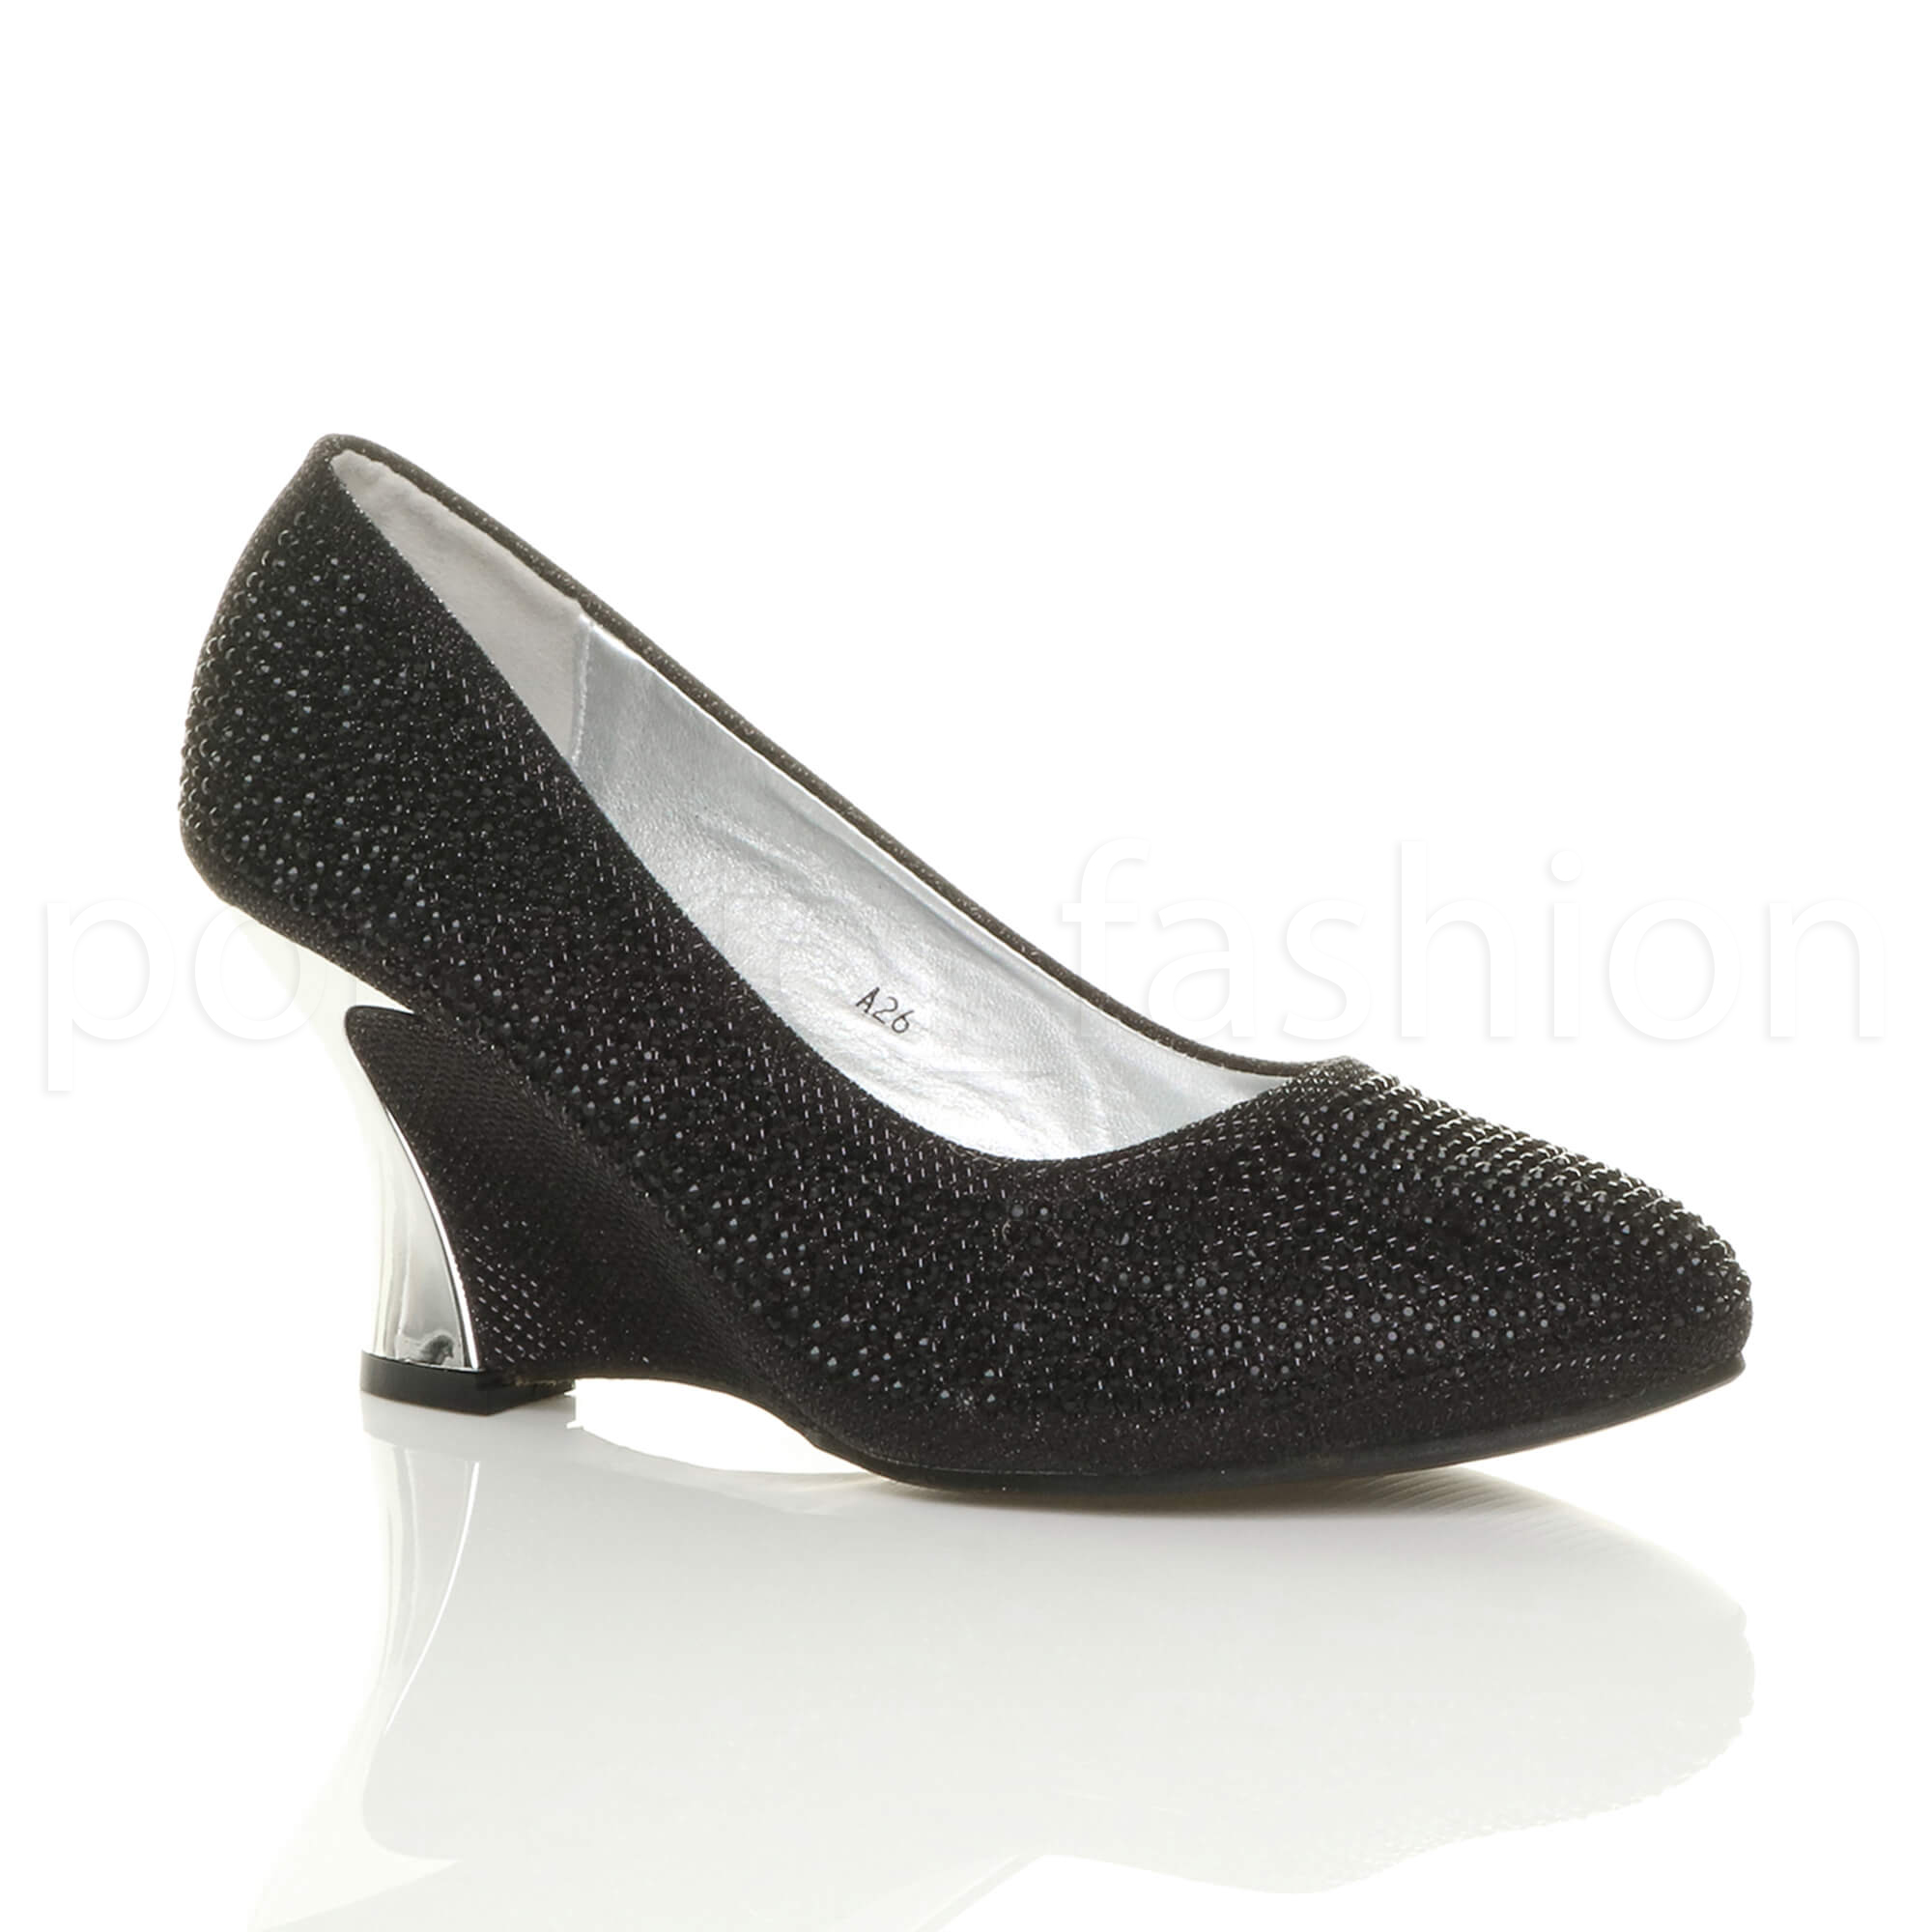 9b72acae171 Black Satin Shoes For WeddingWomen S Bridal Wedding Shoes Dillard S